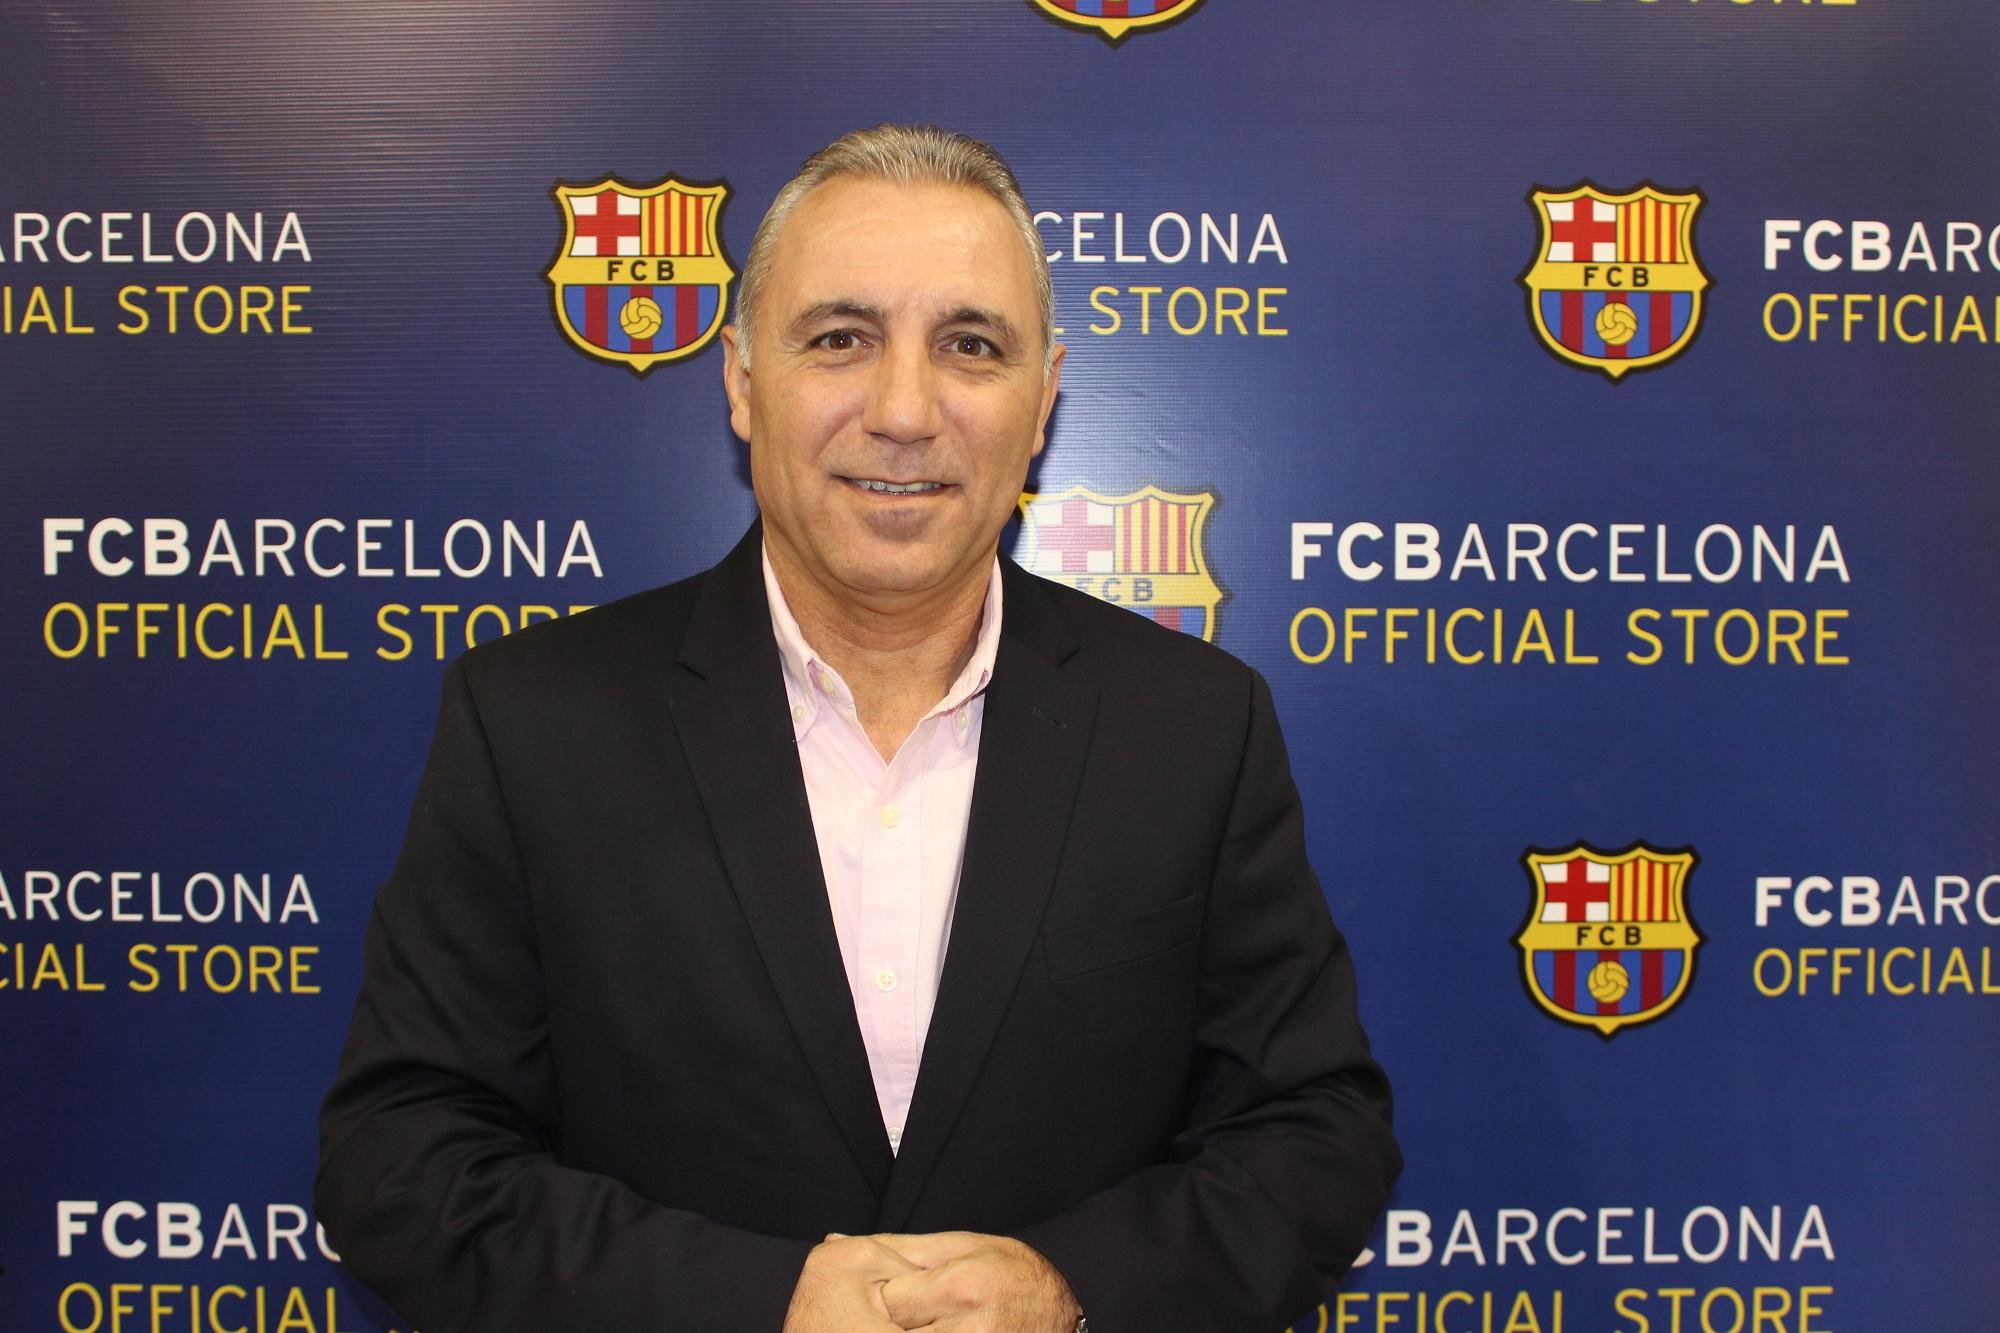 Tienda Barcelona 2 (2)